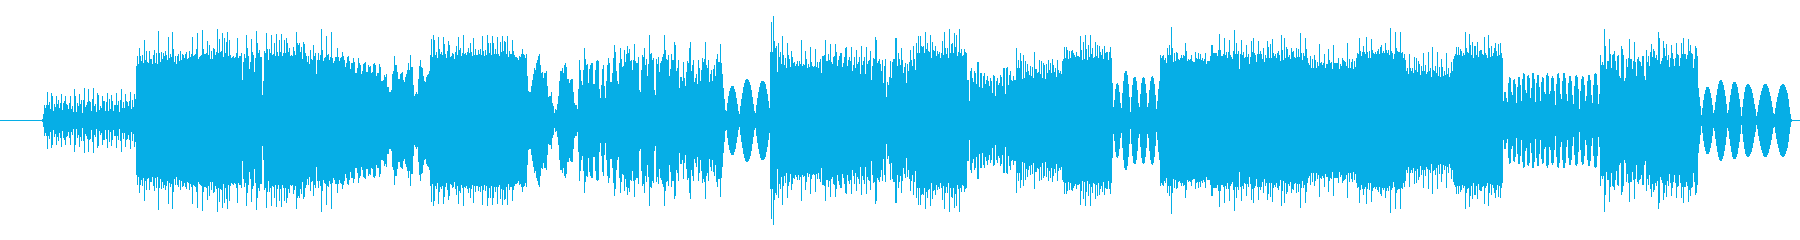 FX 作業ロボット02の再生済みの波形